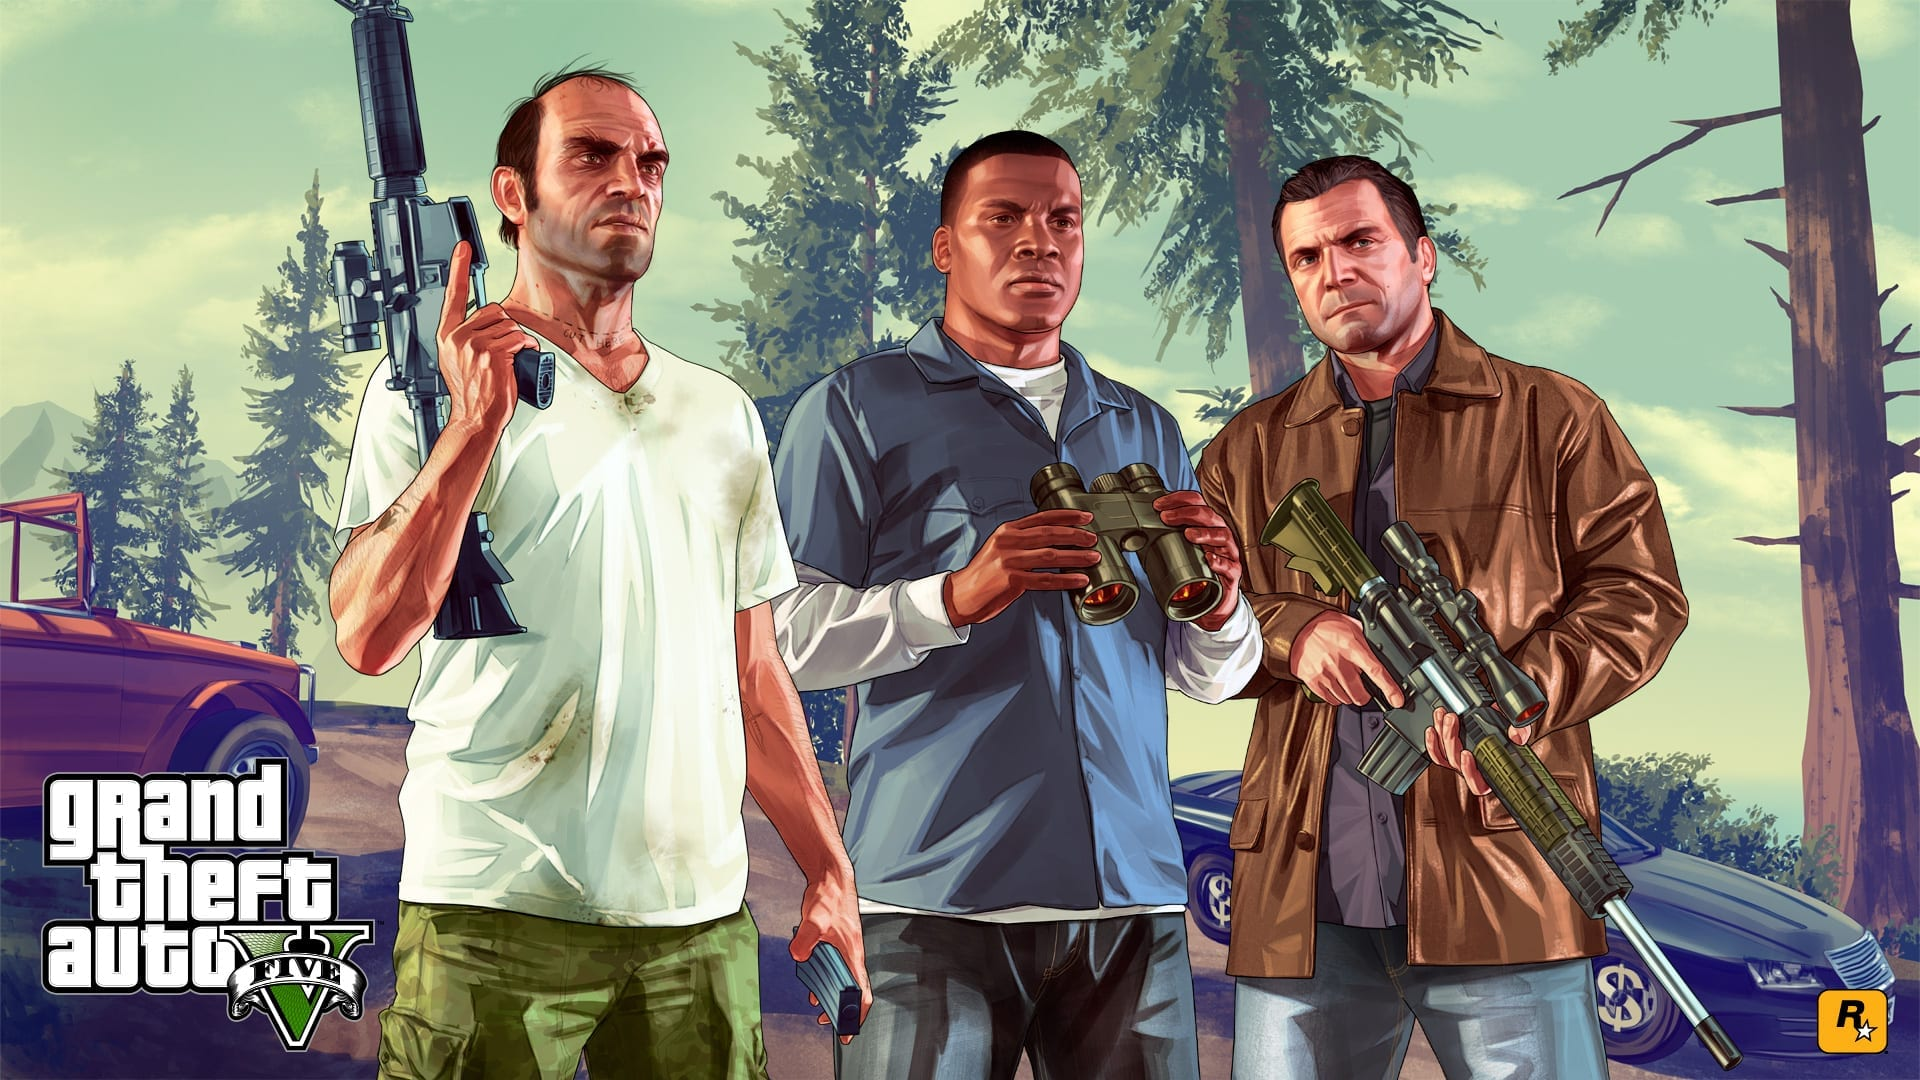 Rockstar Parent Company Hints At 2023 Release For GTA 6